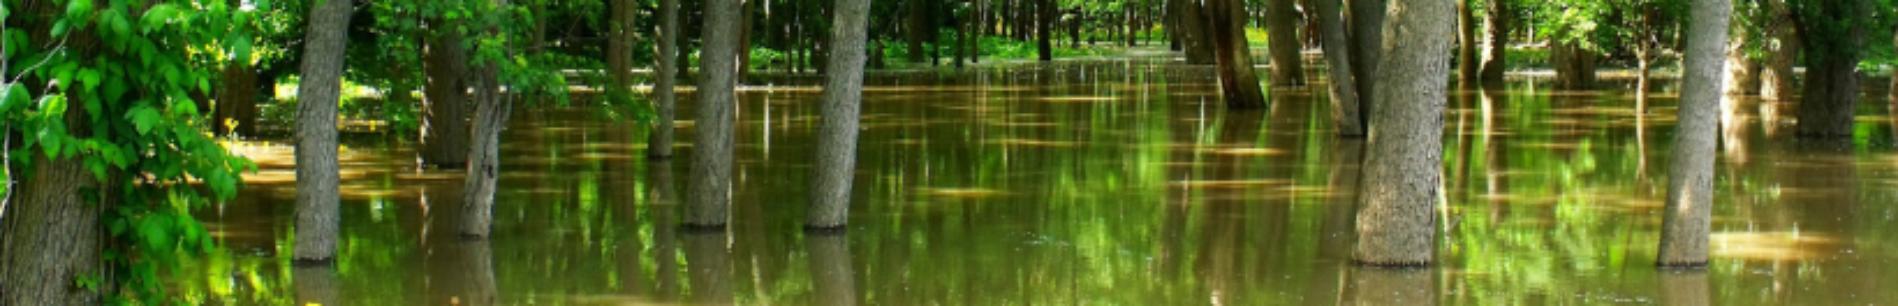 Bandeau Inondation ©hifijohn-pixabay